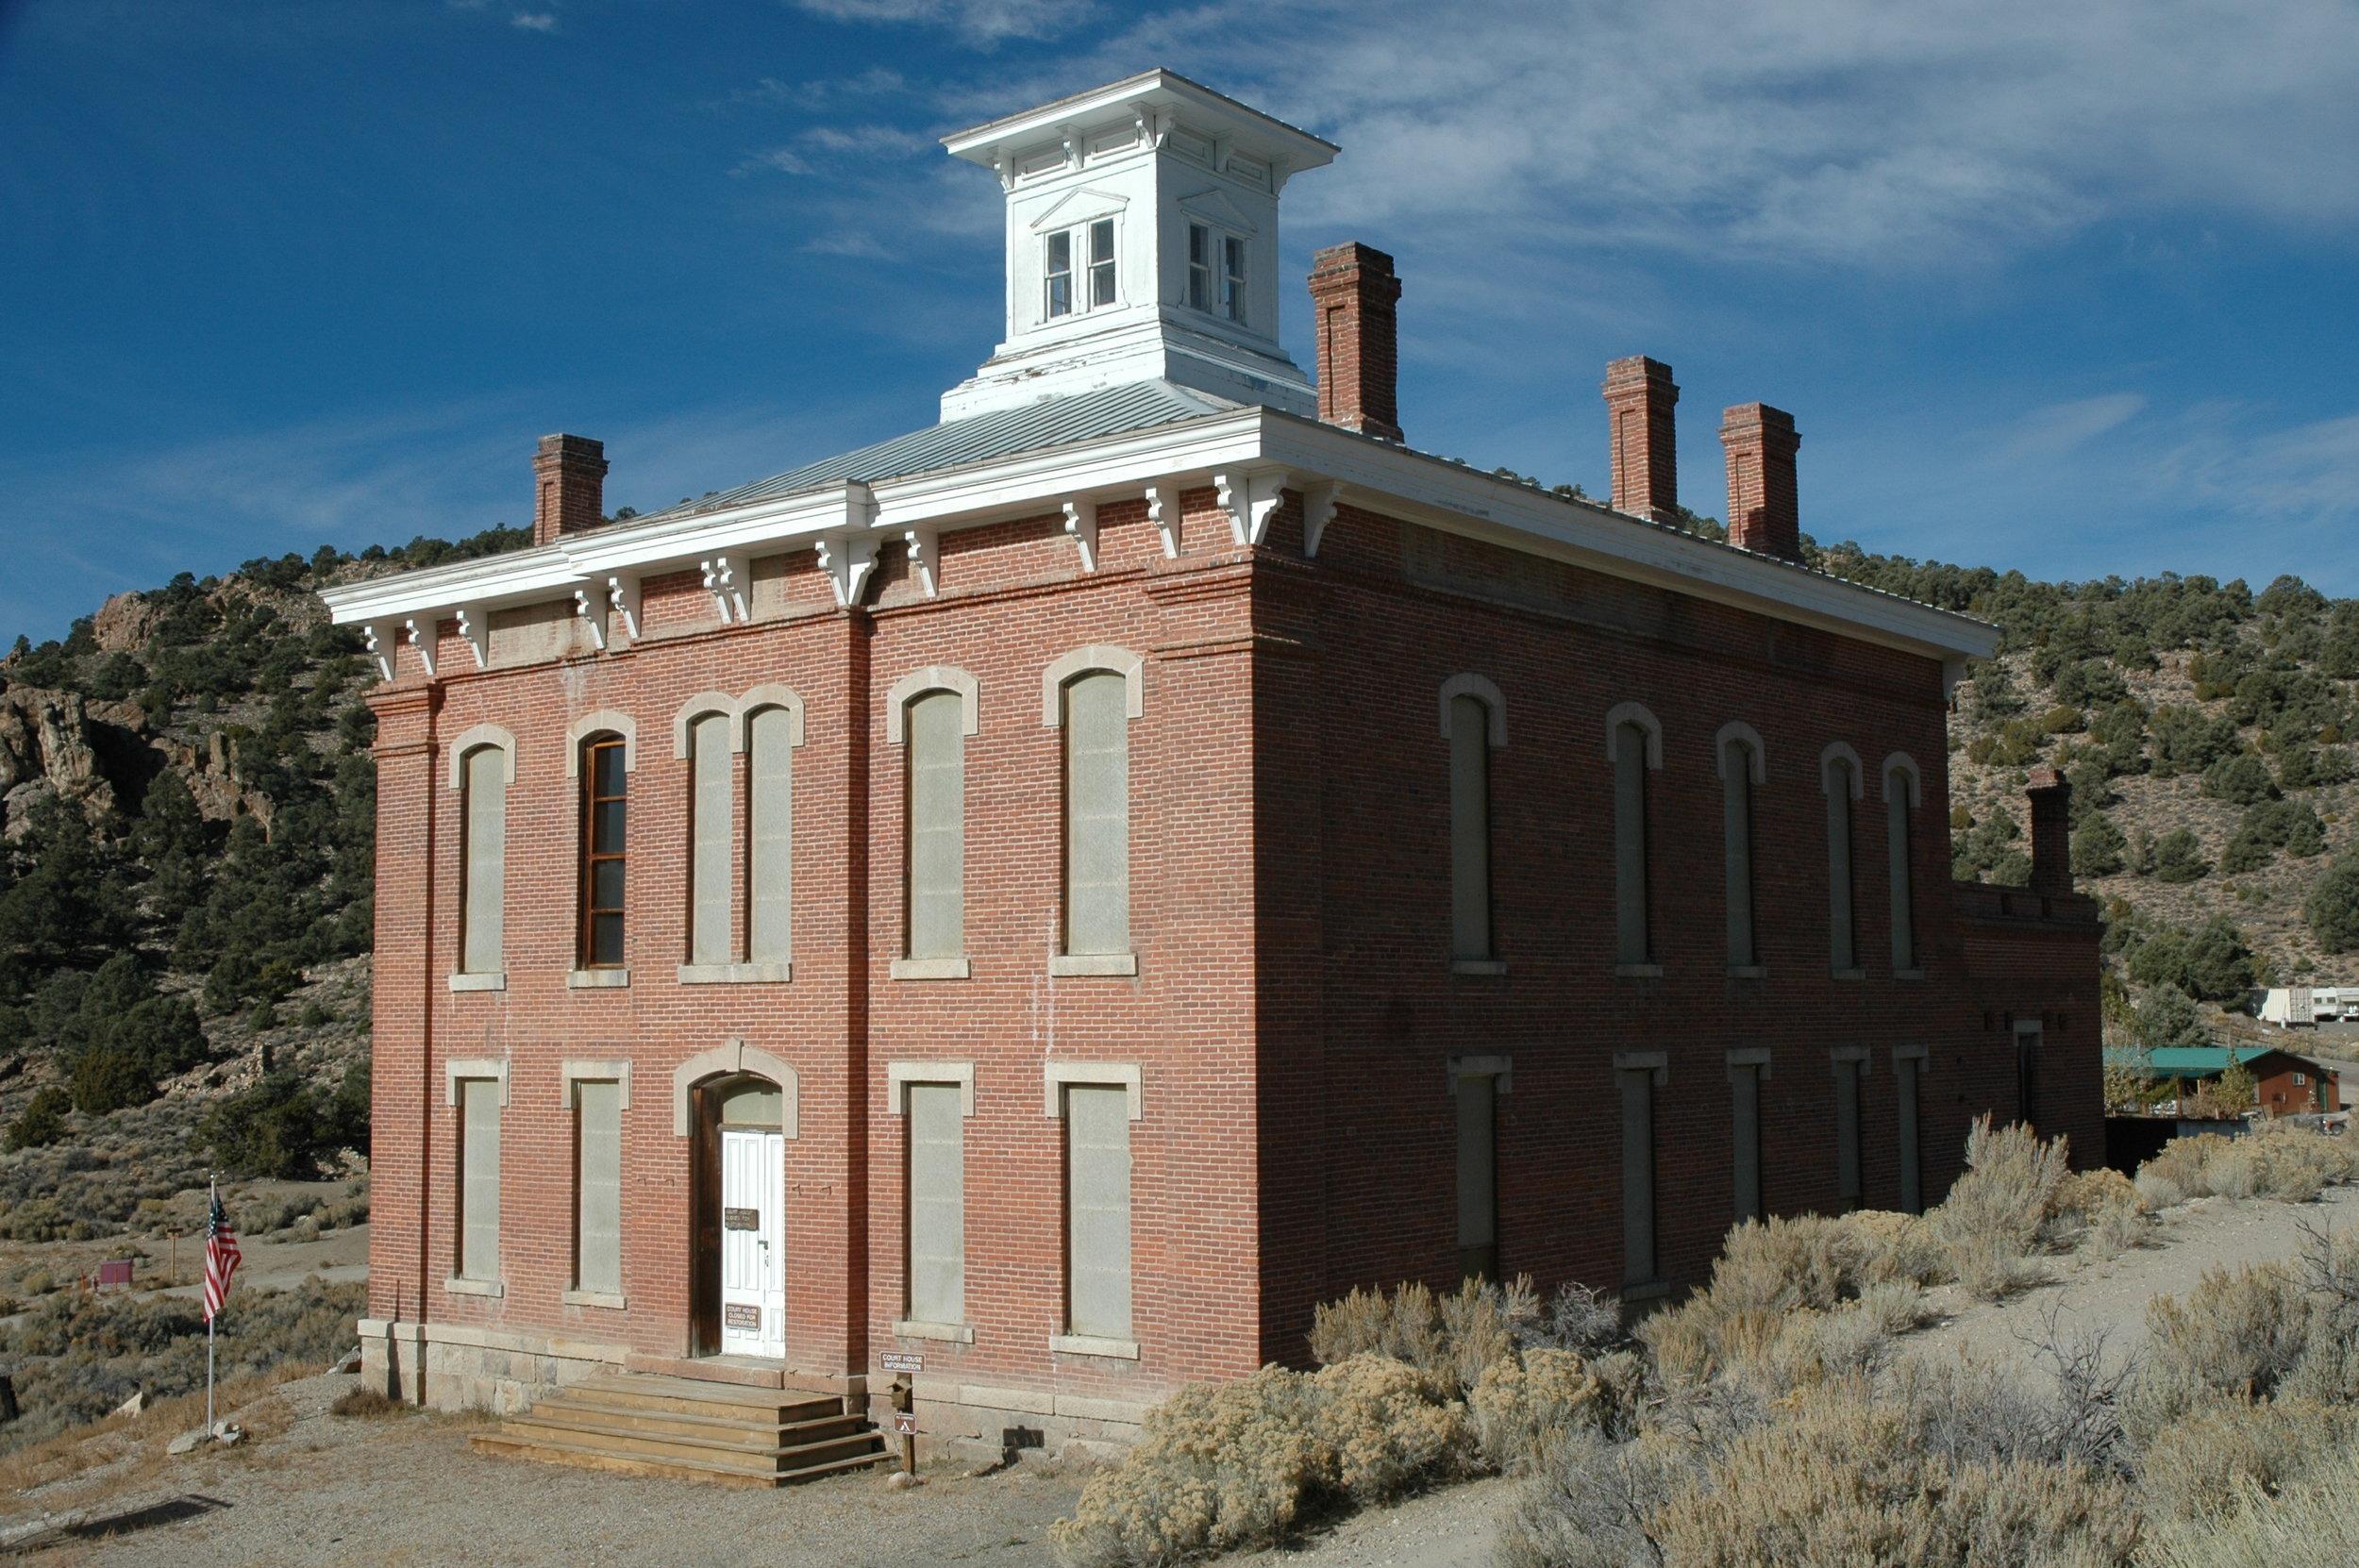 Photo: Wikimedia Commons (https://commons.wikimedia.org/wiki/File:Belmont,_NV_Courthouse.jpg)